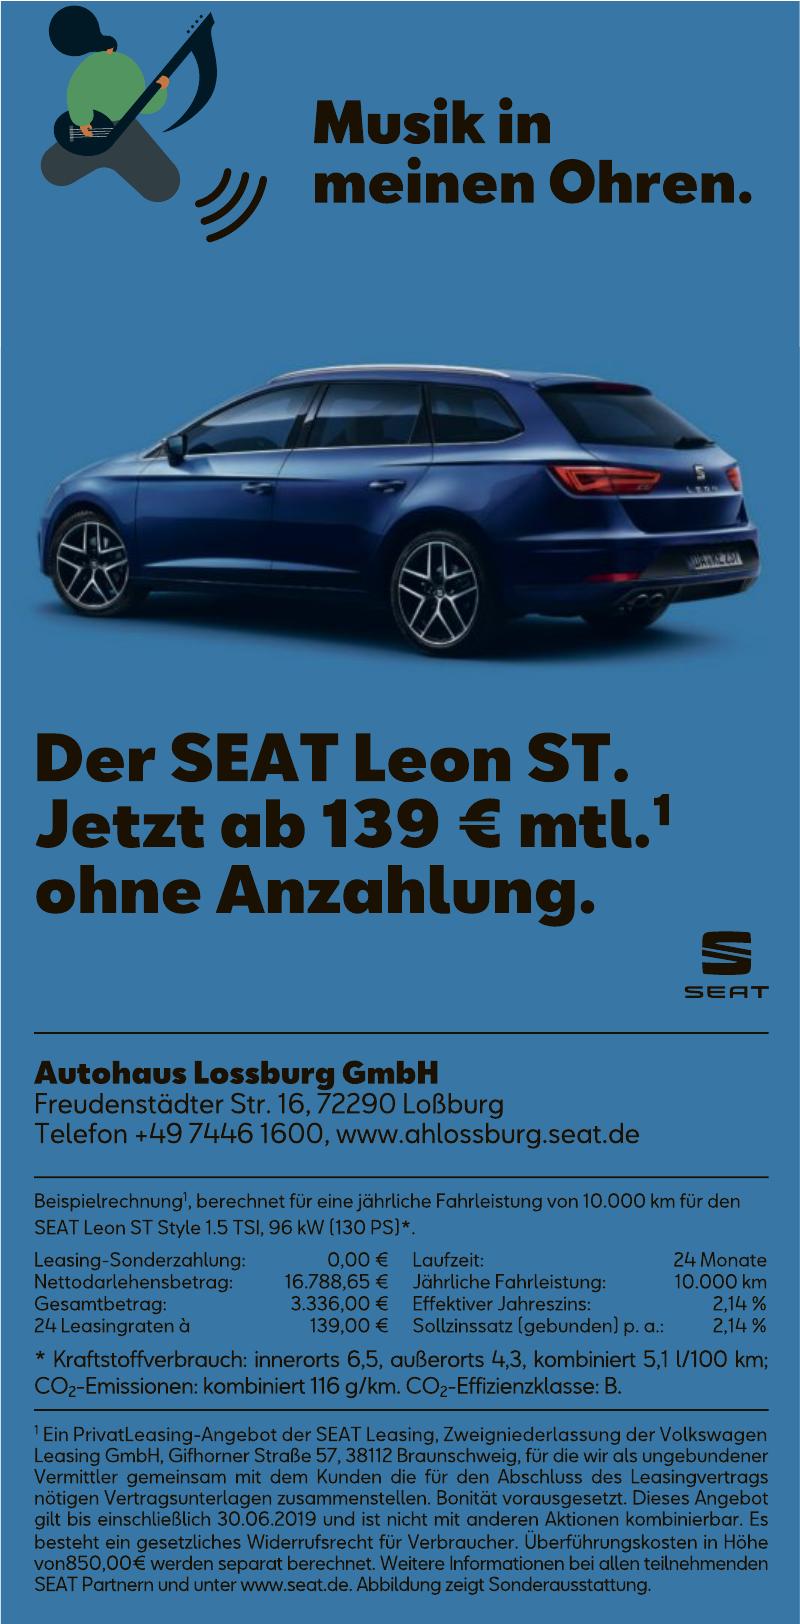 Autohaus Lossburg GmbH